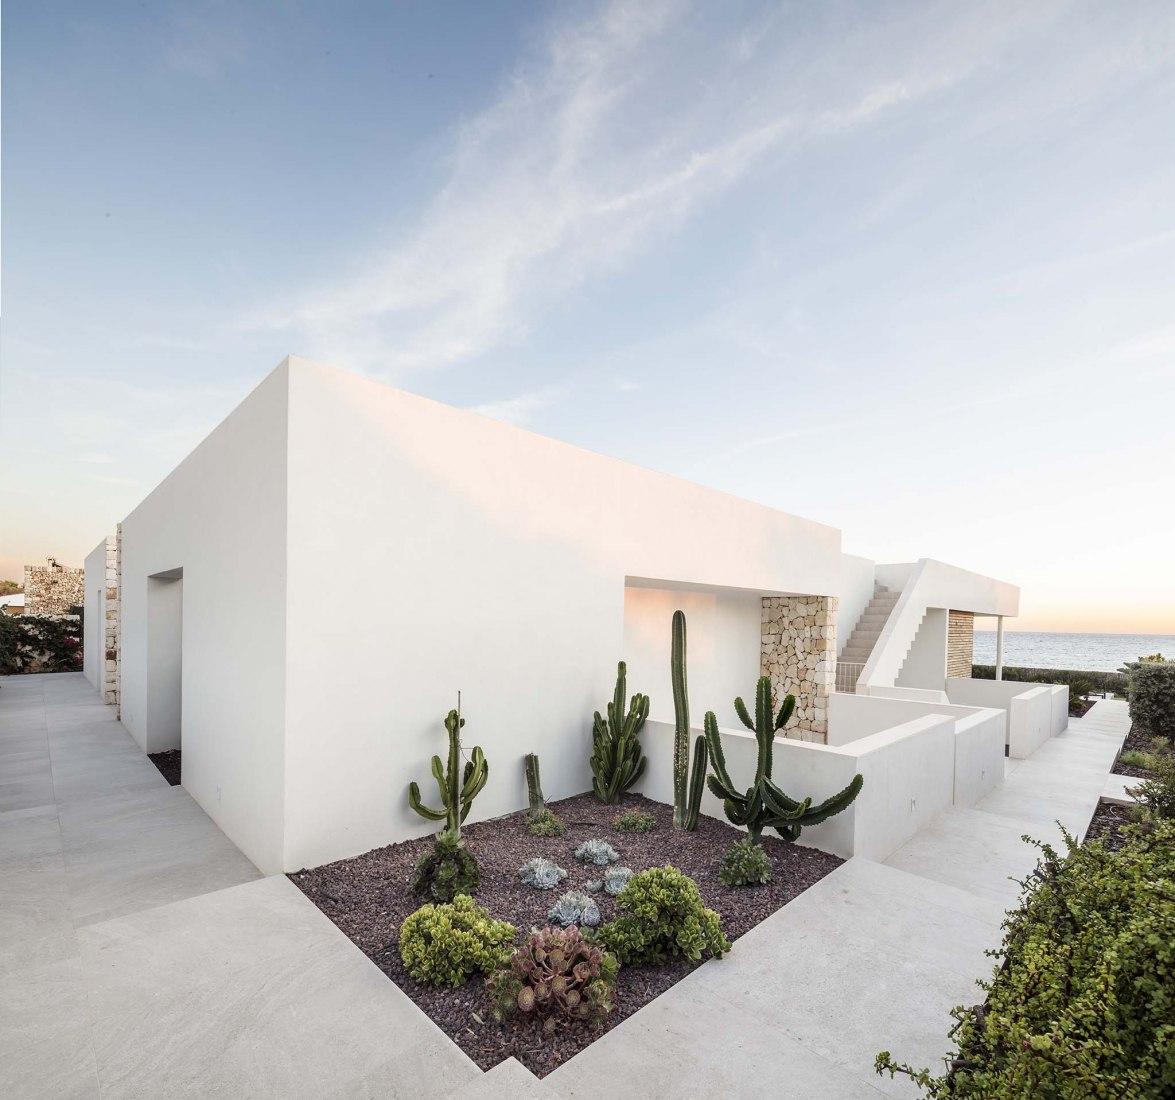 Casa M por Gabriel Montañés. Fotografía por Adrià Goula